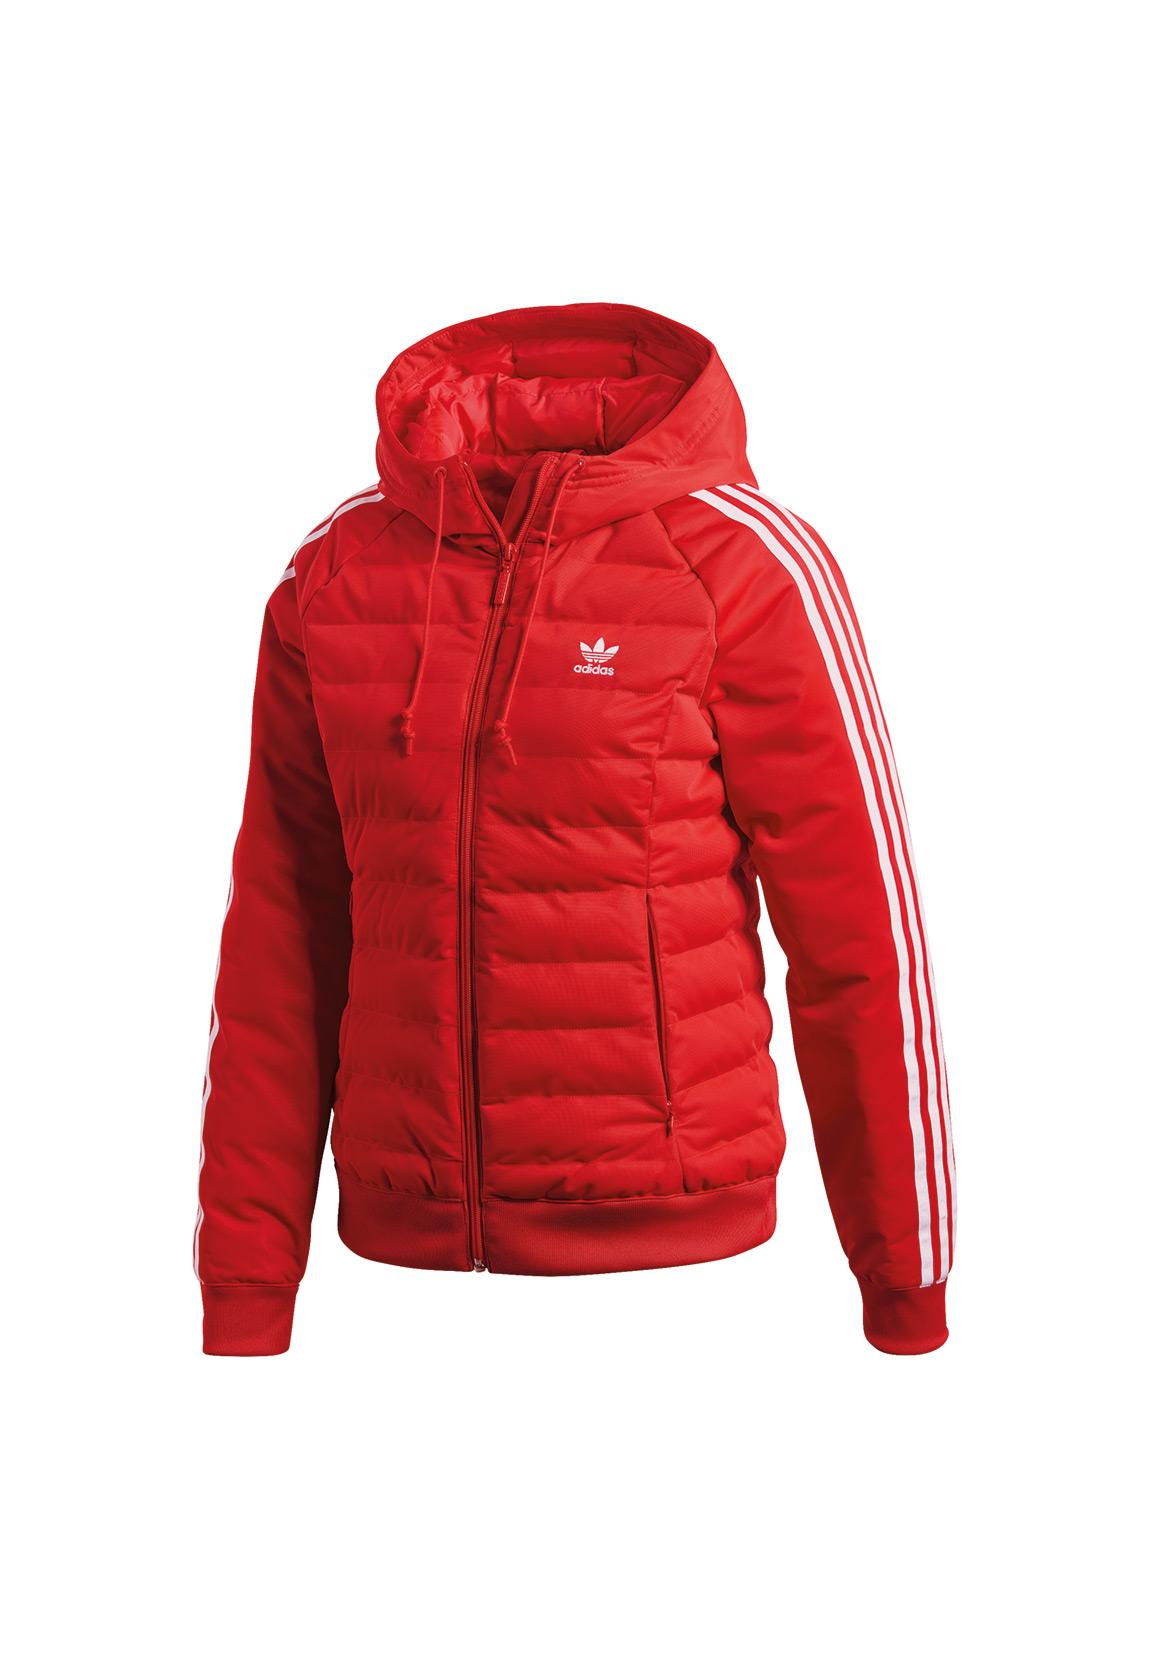 c6c629869160 ... Adidas Jacke Damen SLIM JACKET DH4585 Rot wholesale dealer 783ae 63af5  ...